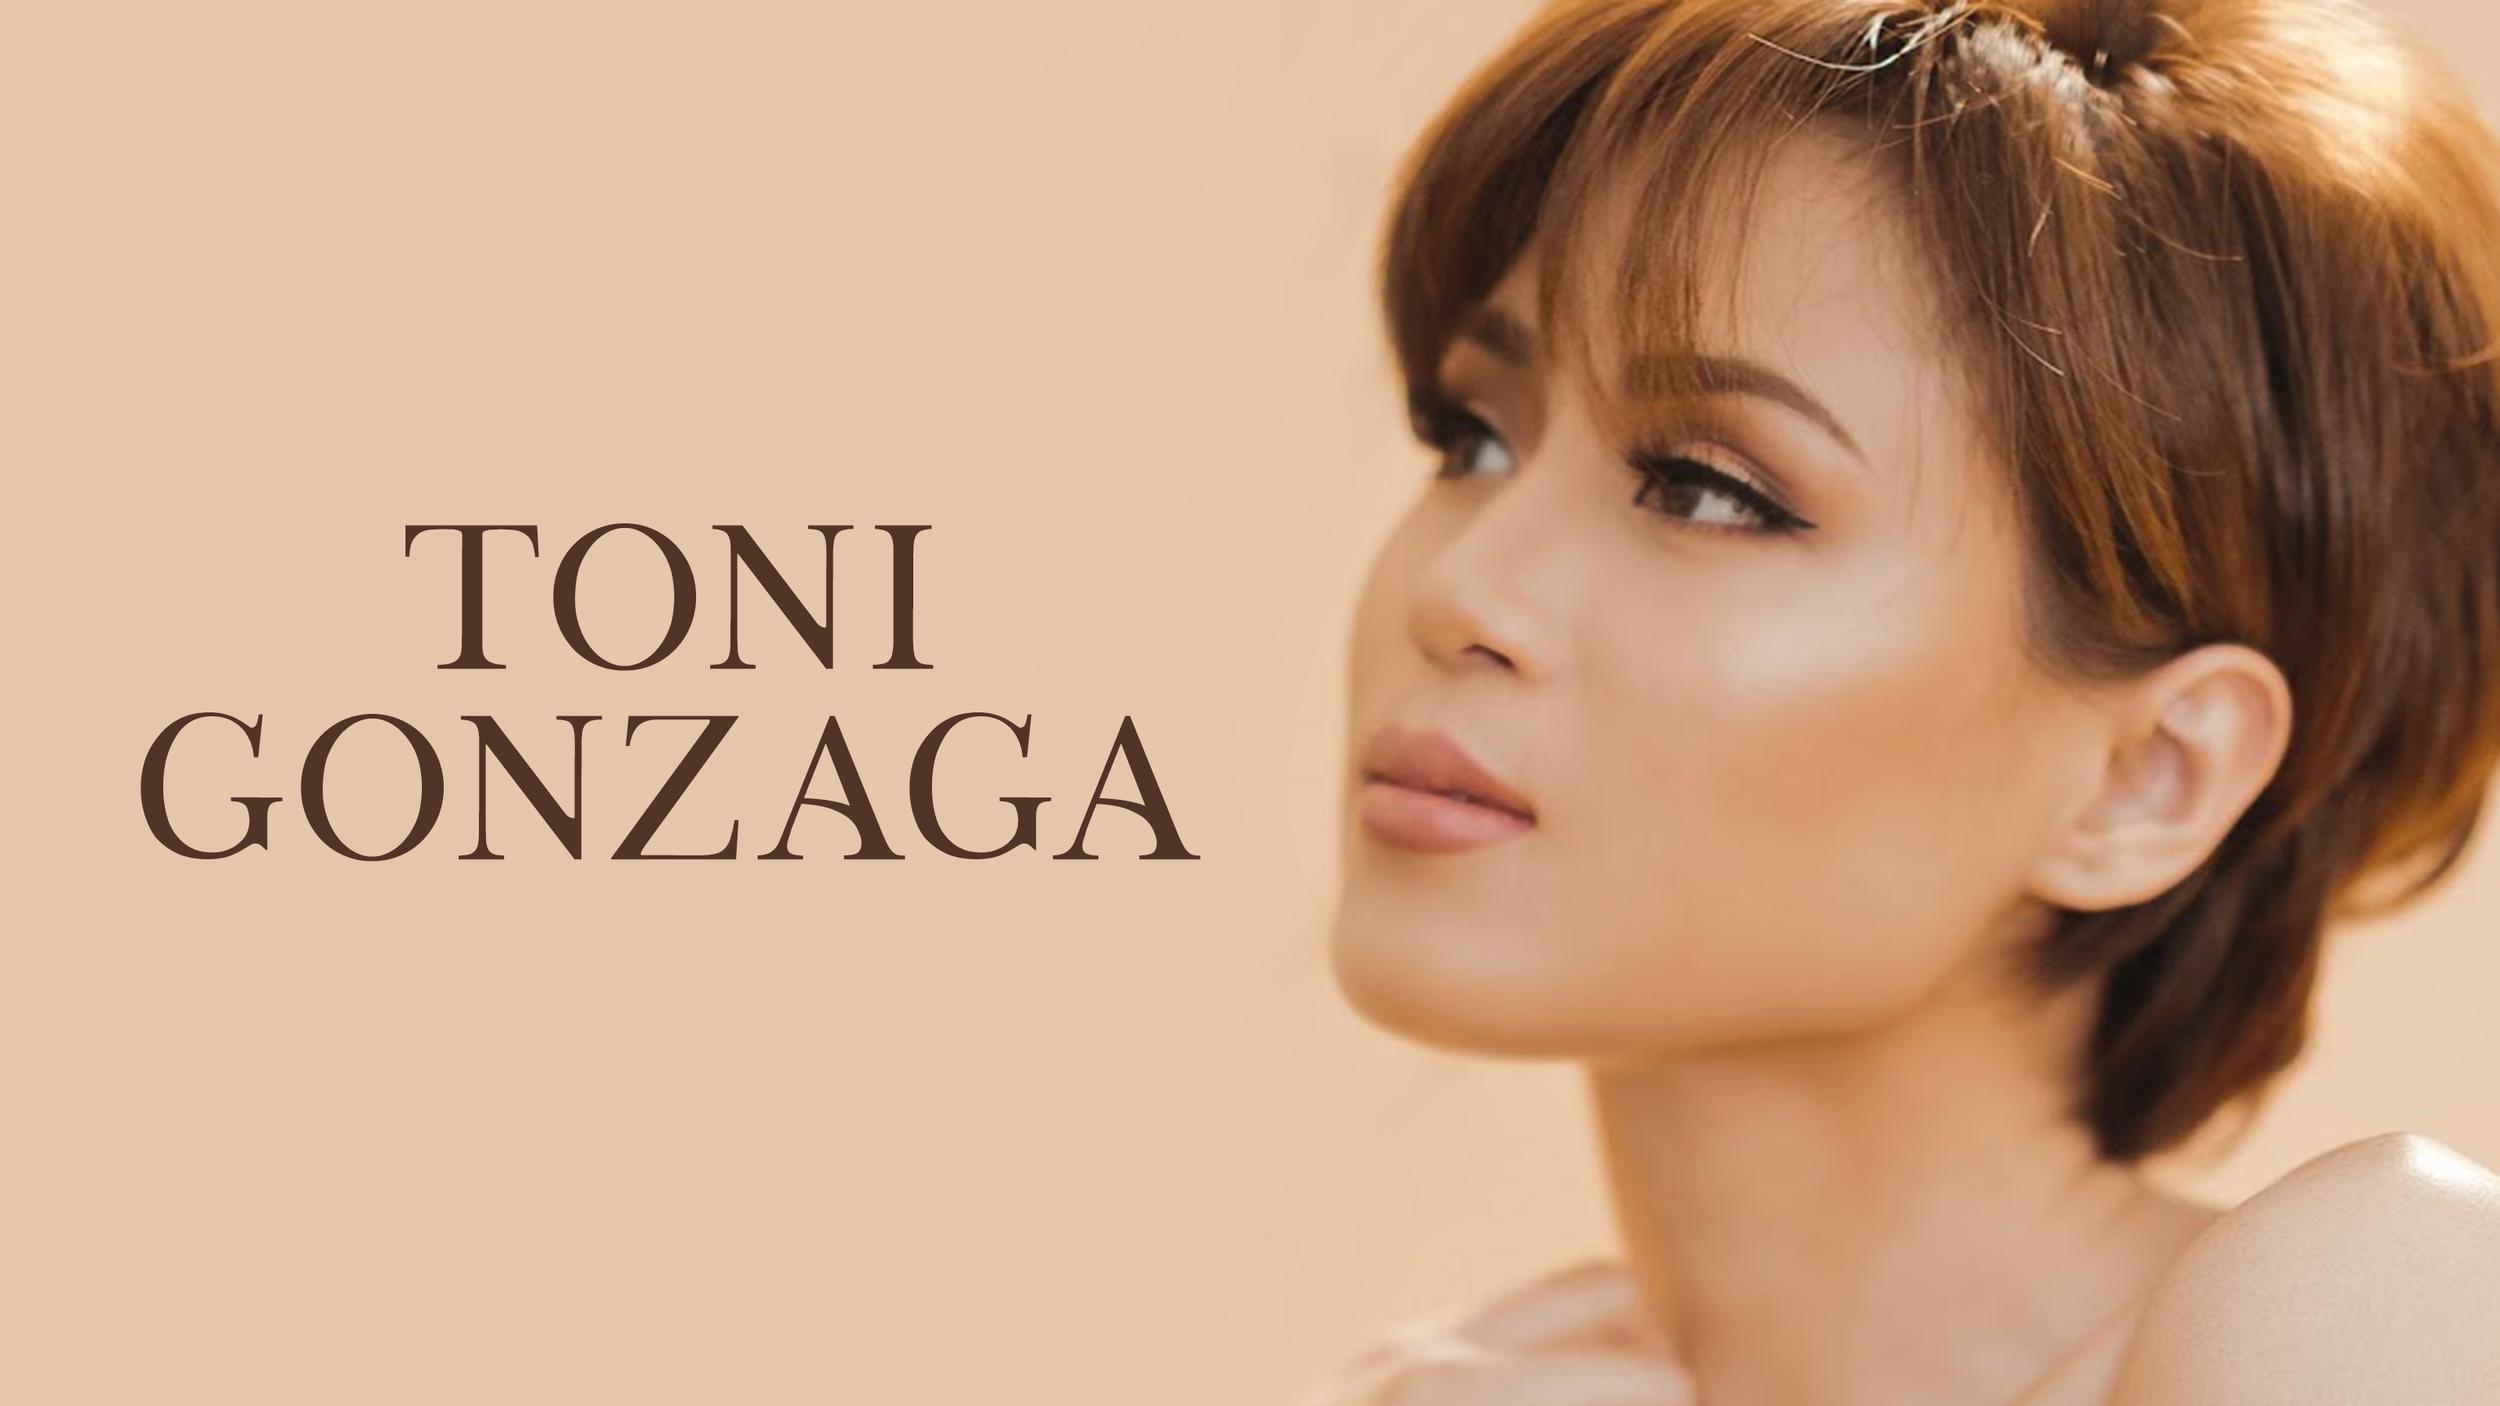 Toni-Gonzaga.png